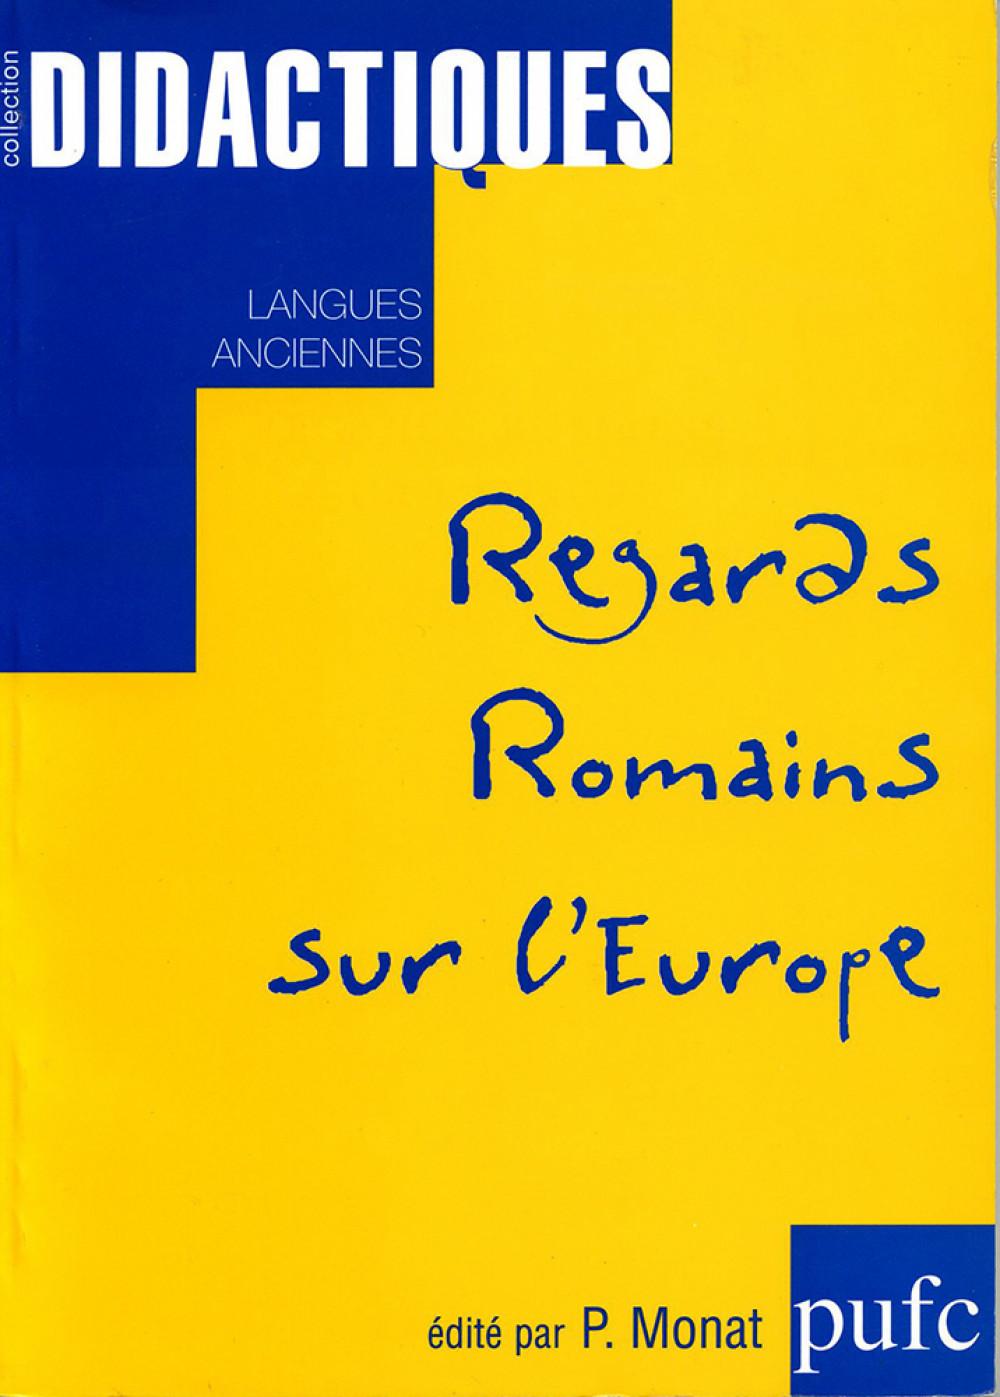 Regards Romains sur l'Europe